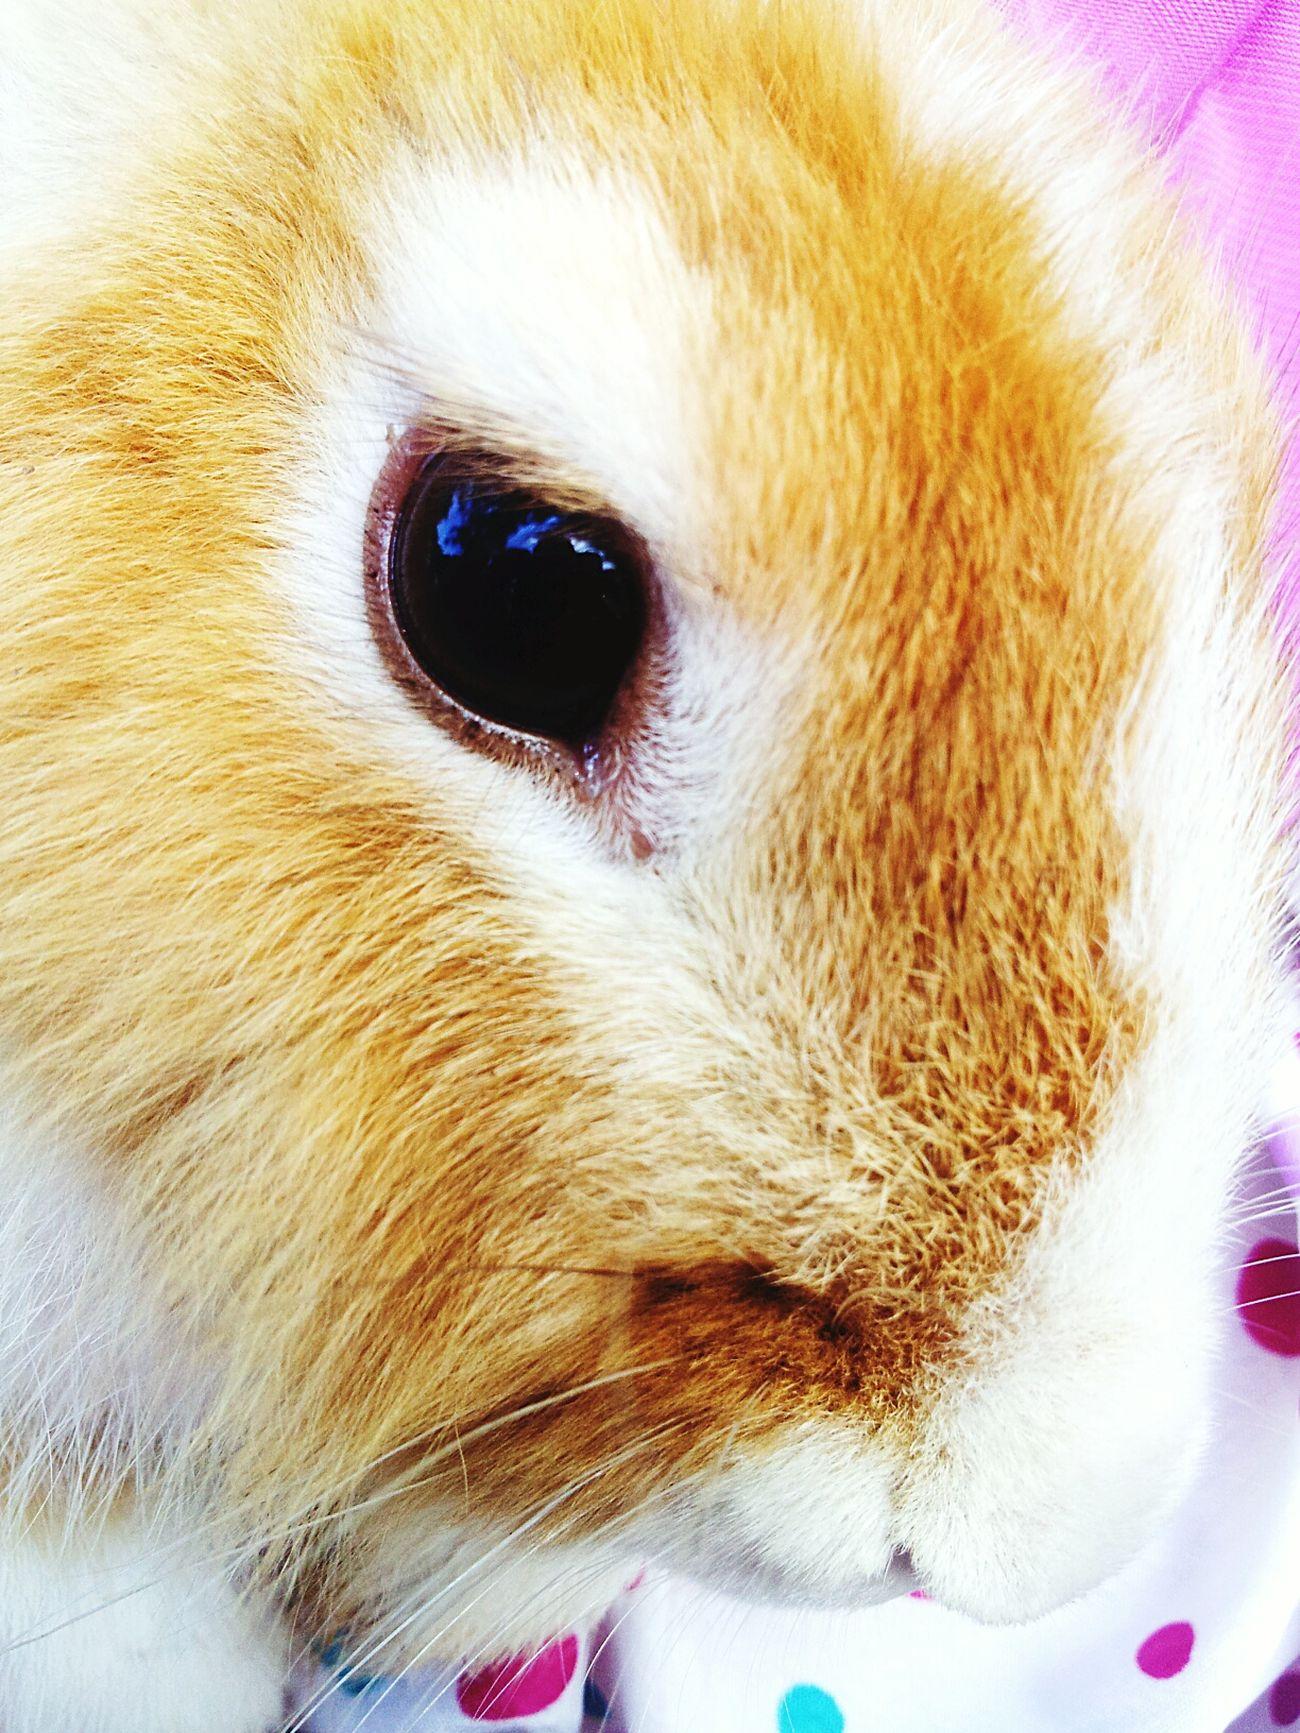 Rabbit ❤️